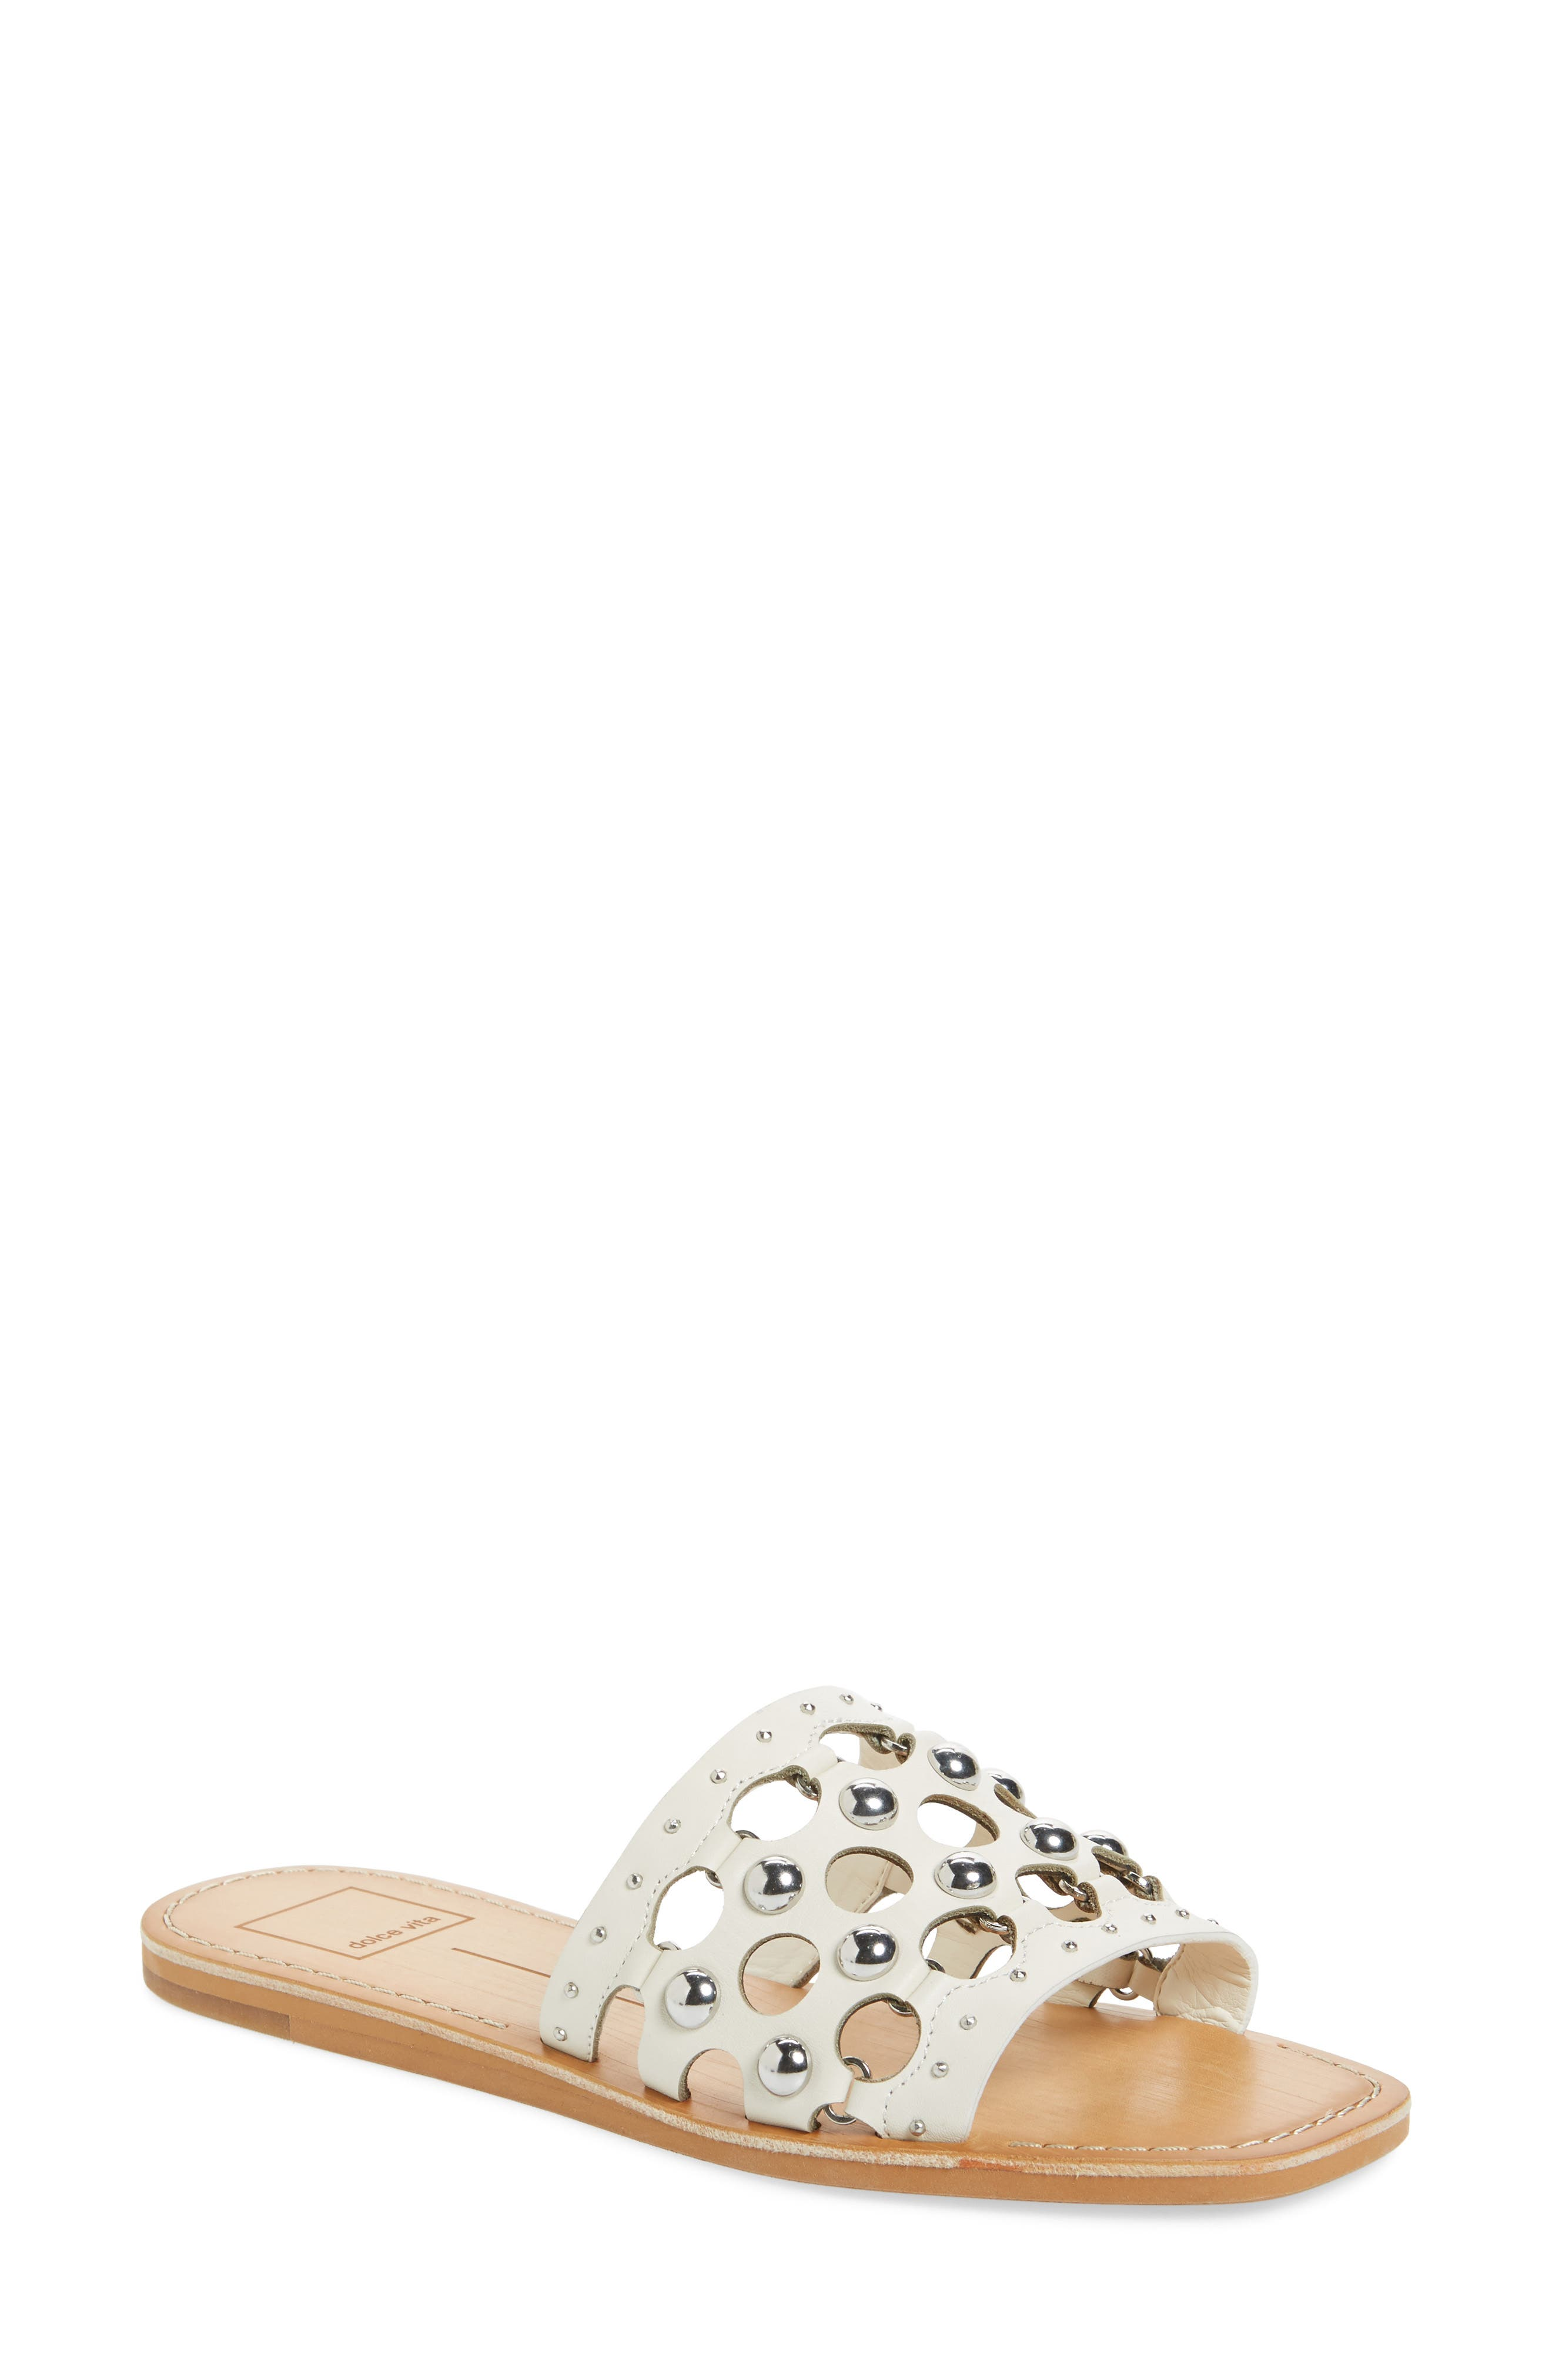 Main Image - Dolce Vita Celita Perforated Studded Slide Sandal (Women)